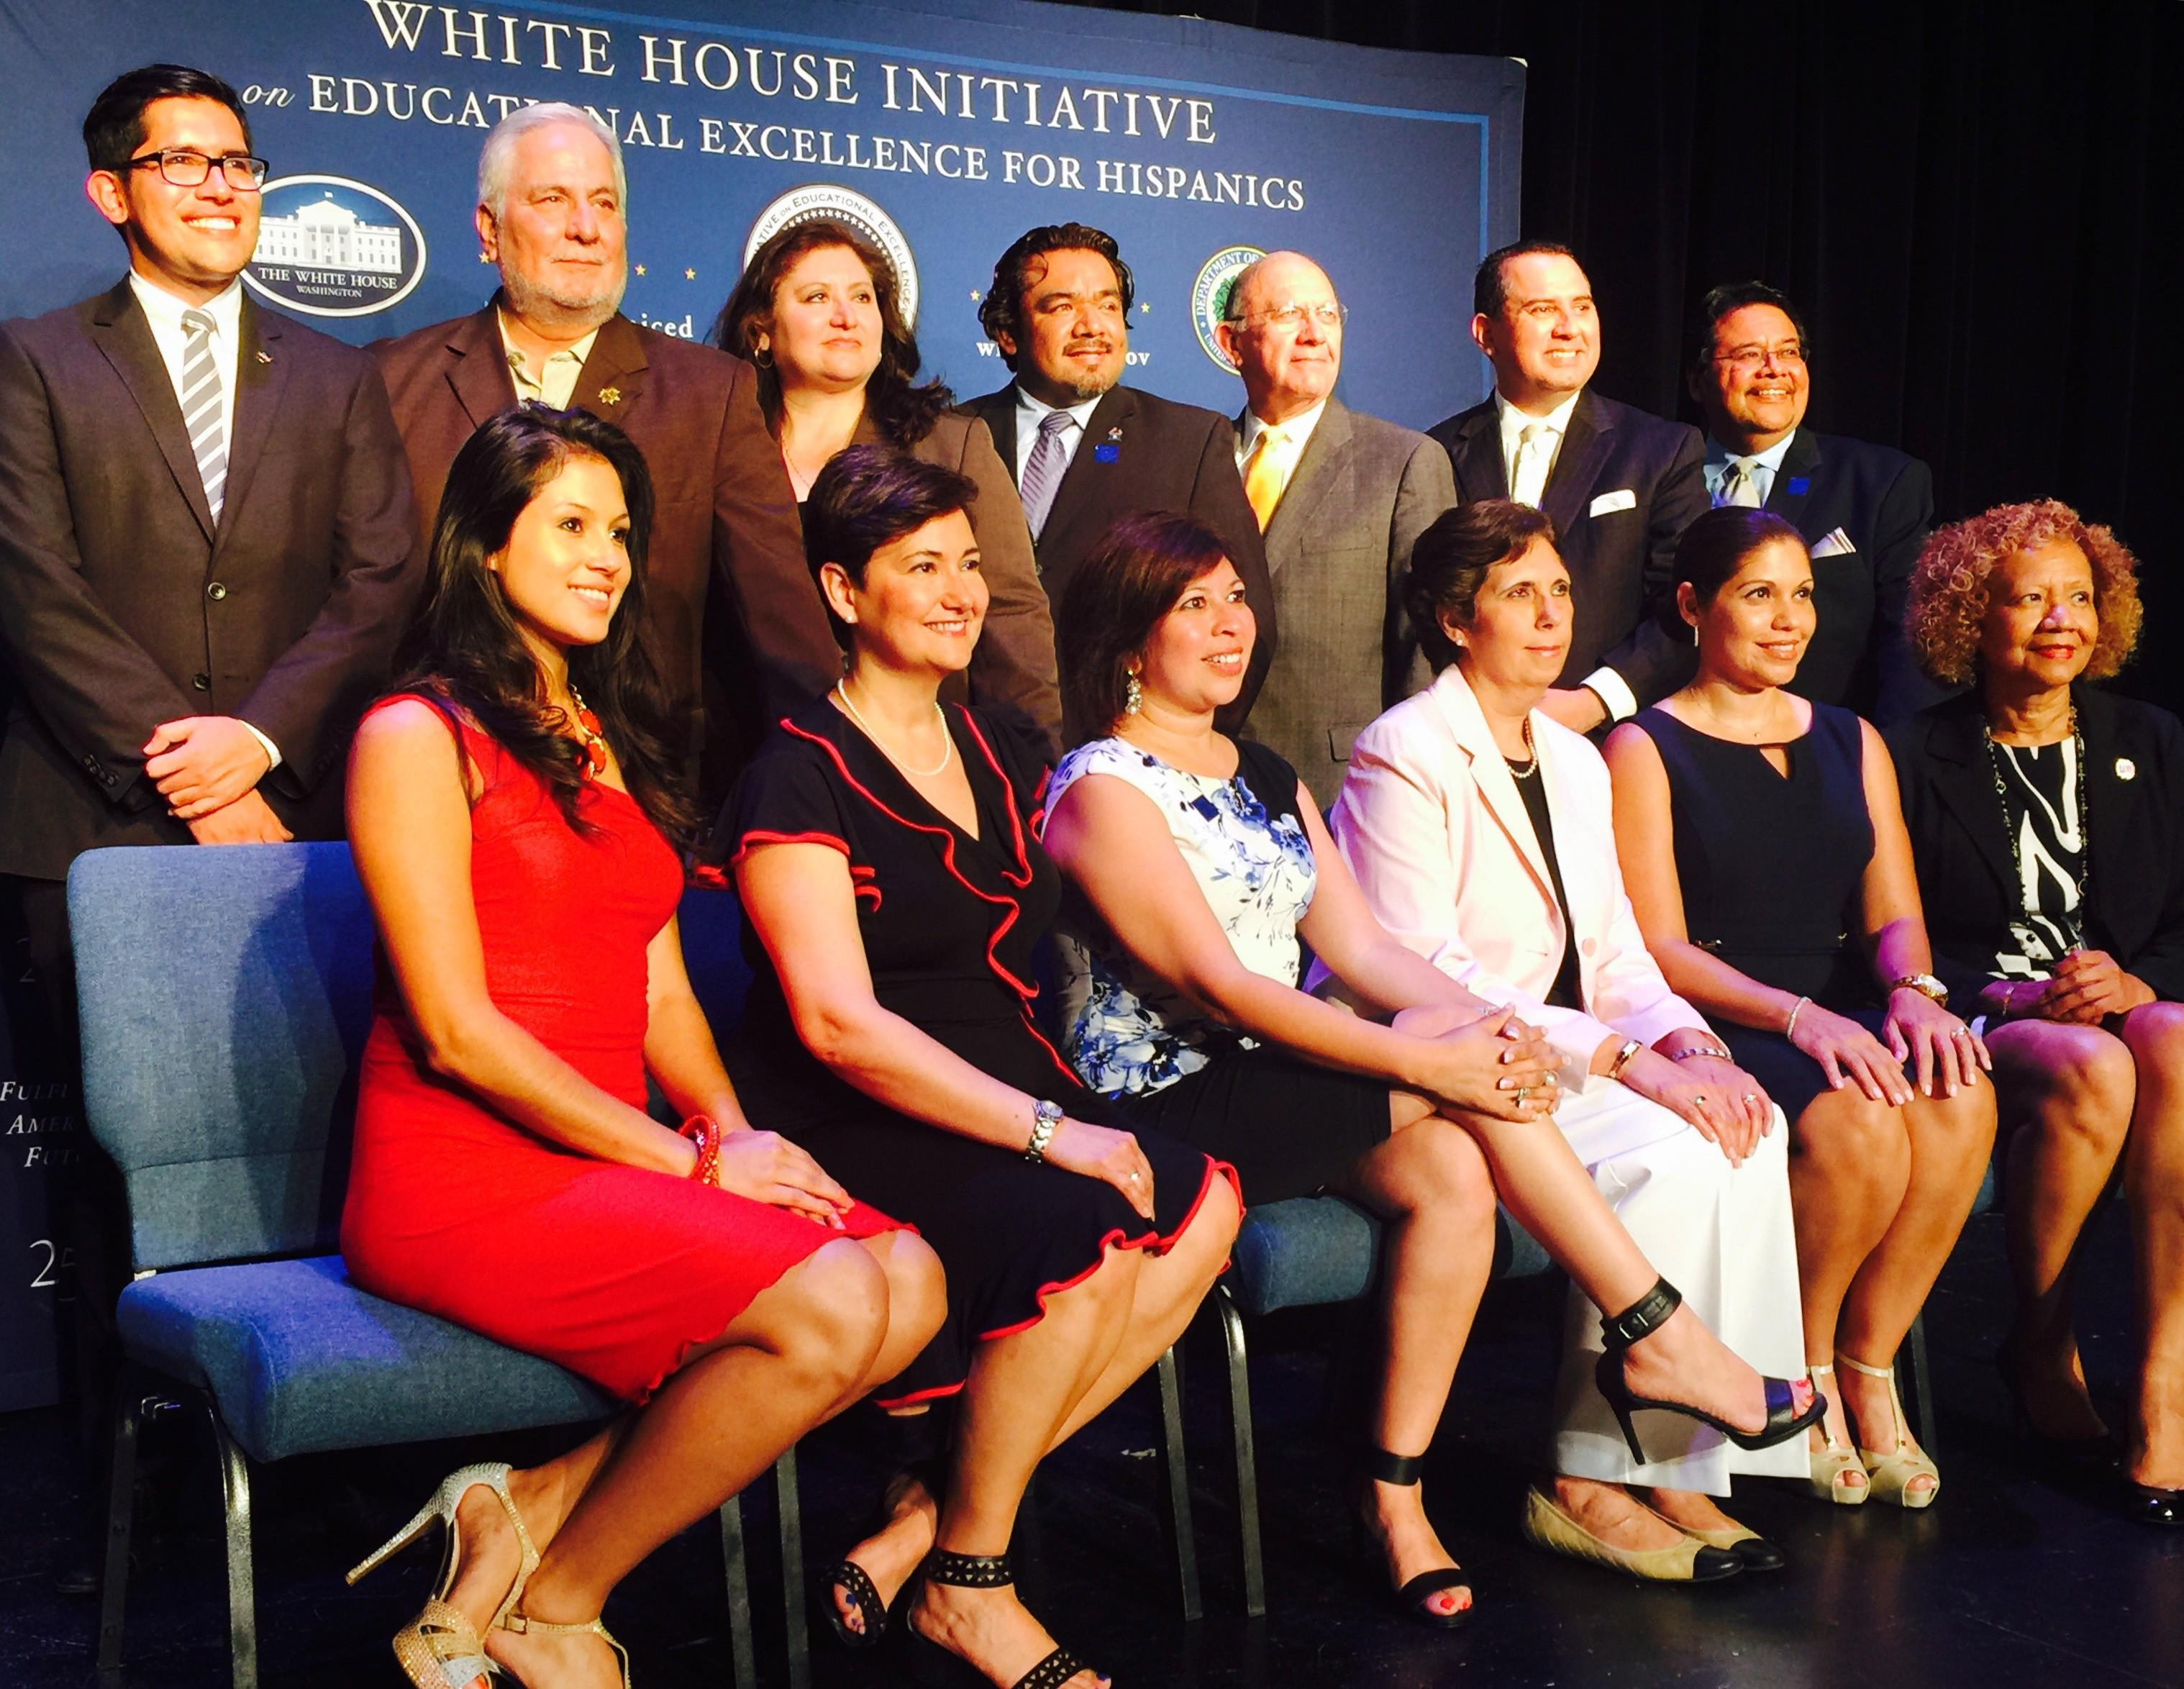 Melissa Rascon @ White House Initiatives on Education Excellence for Hispanics Ceremony